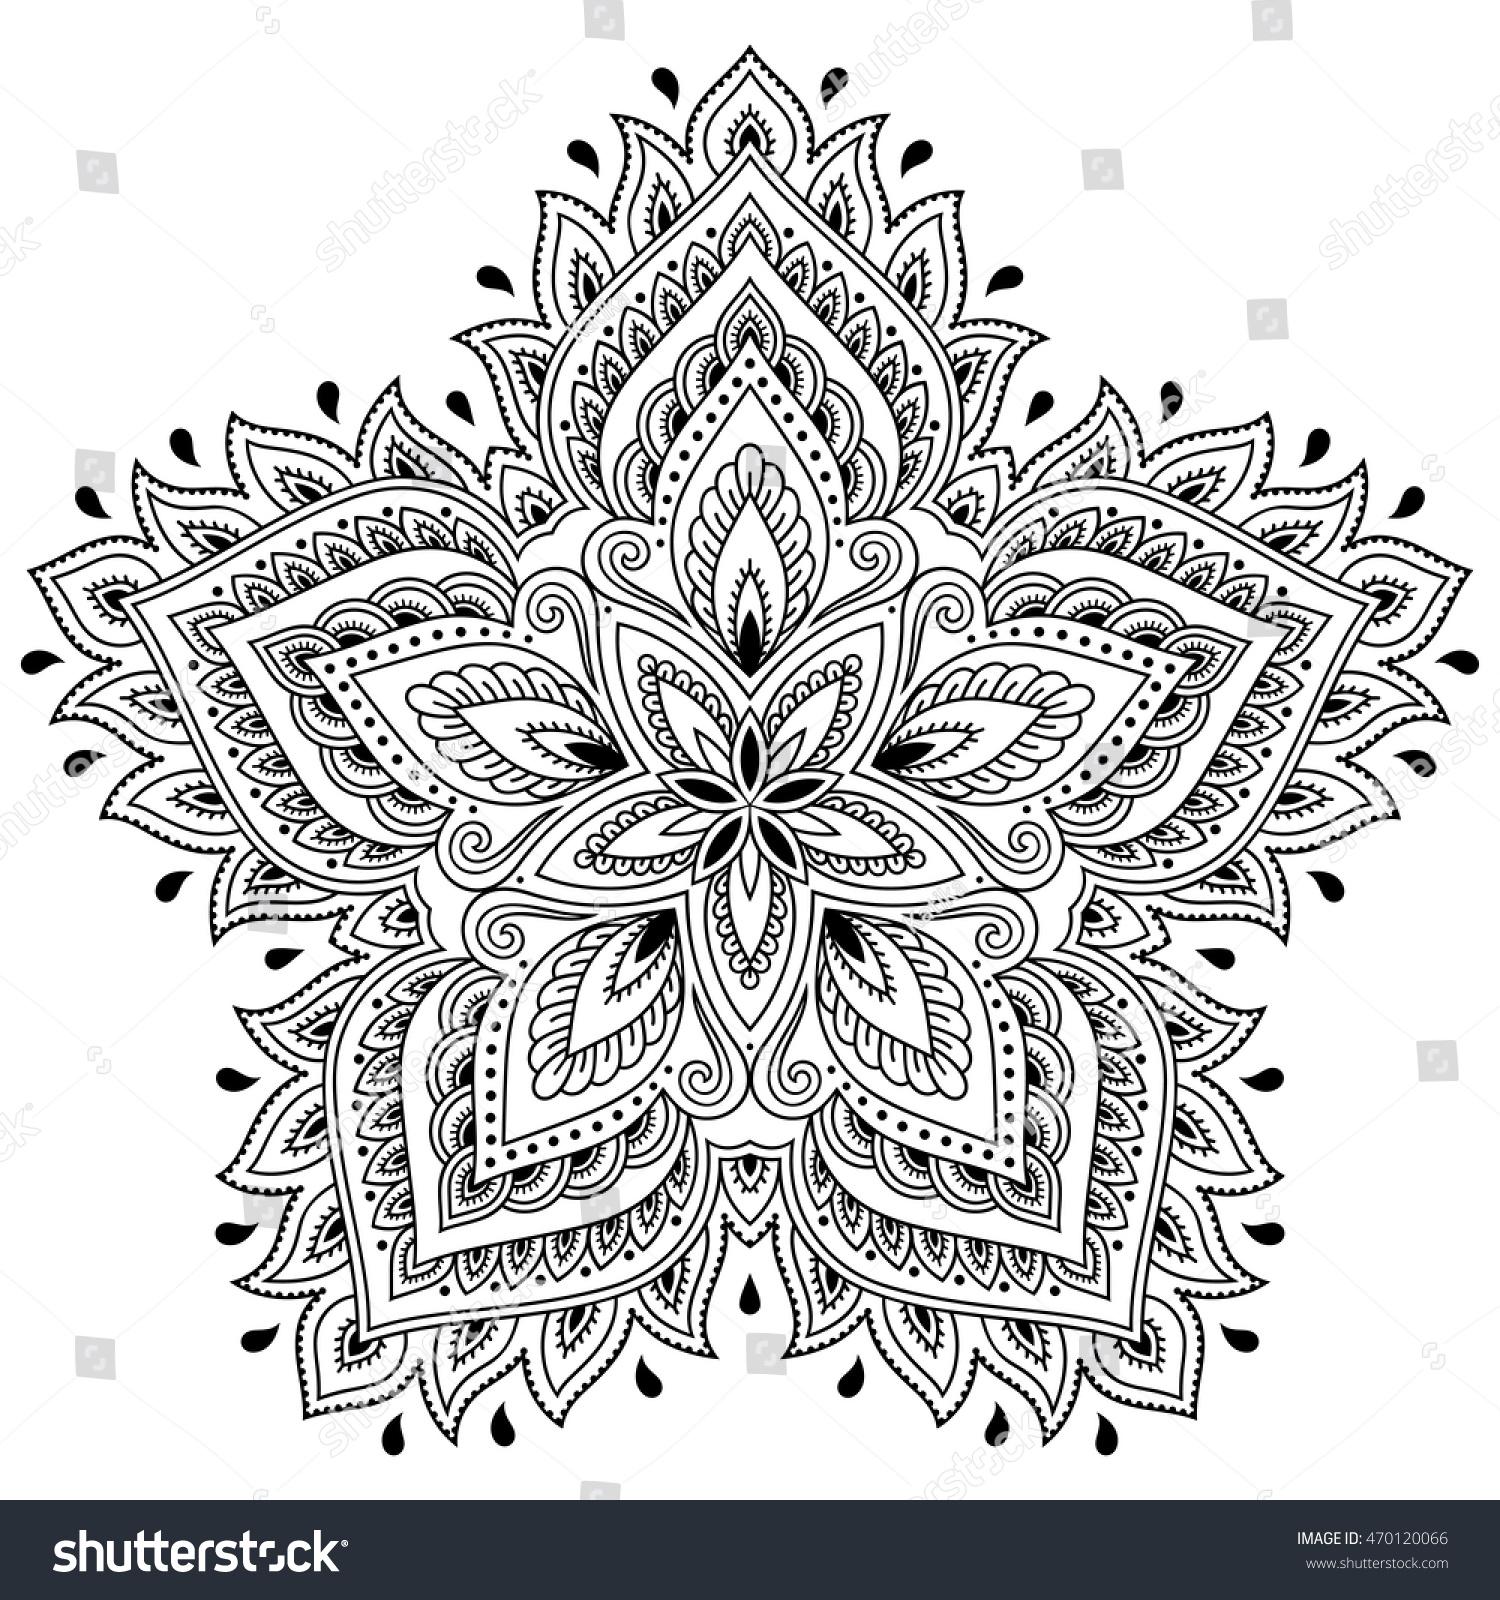 Handdrawn Floral Linear Mandala Achromatic Vector Illustration